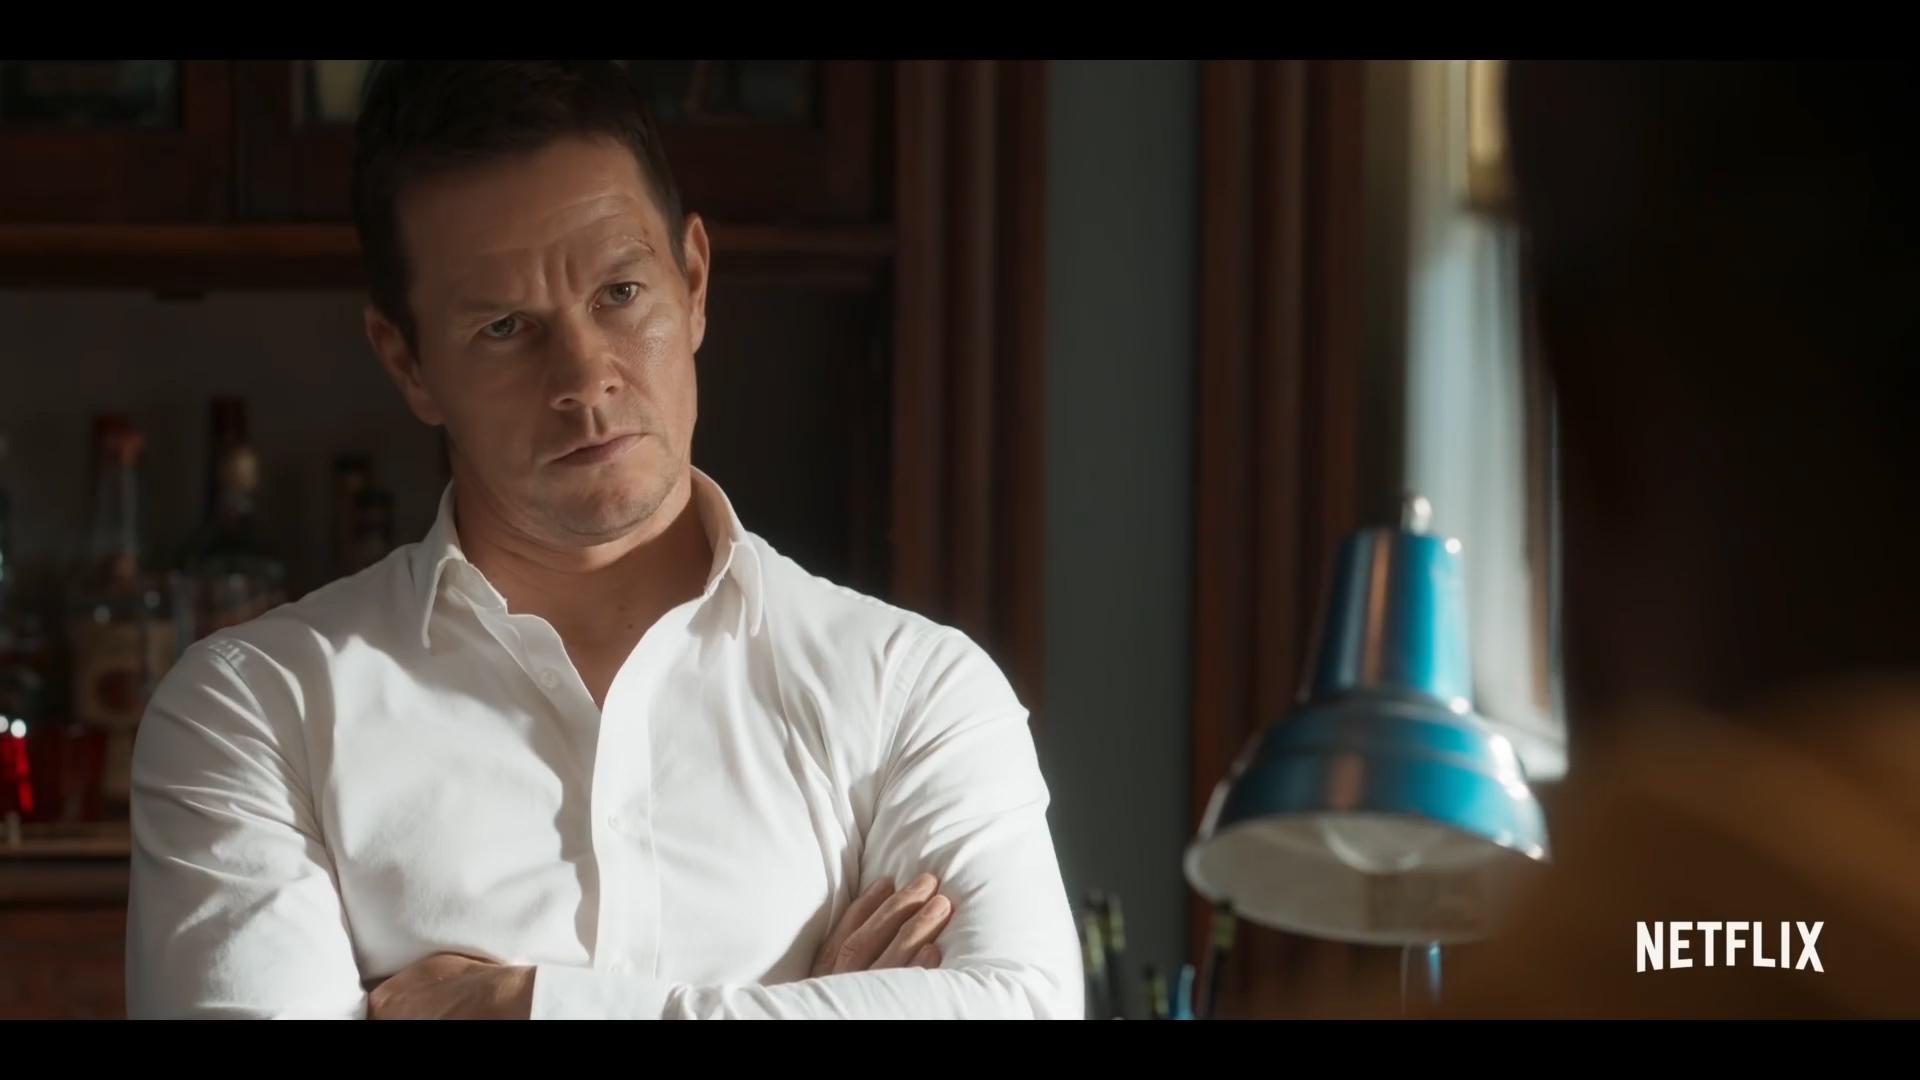 [1] Spenser Confidential - Official Trailer